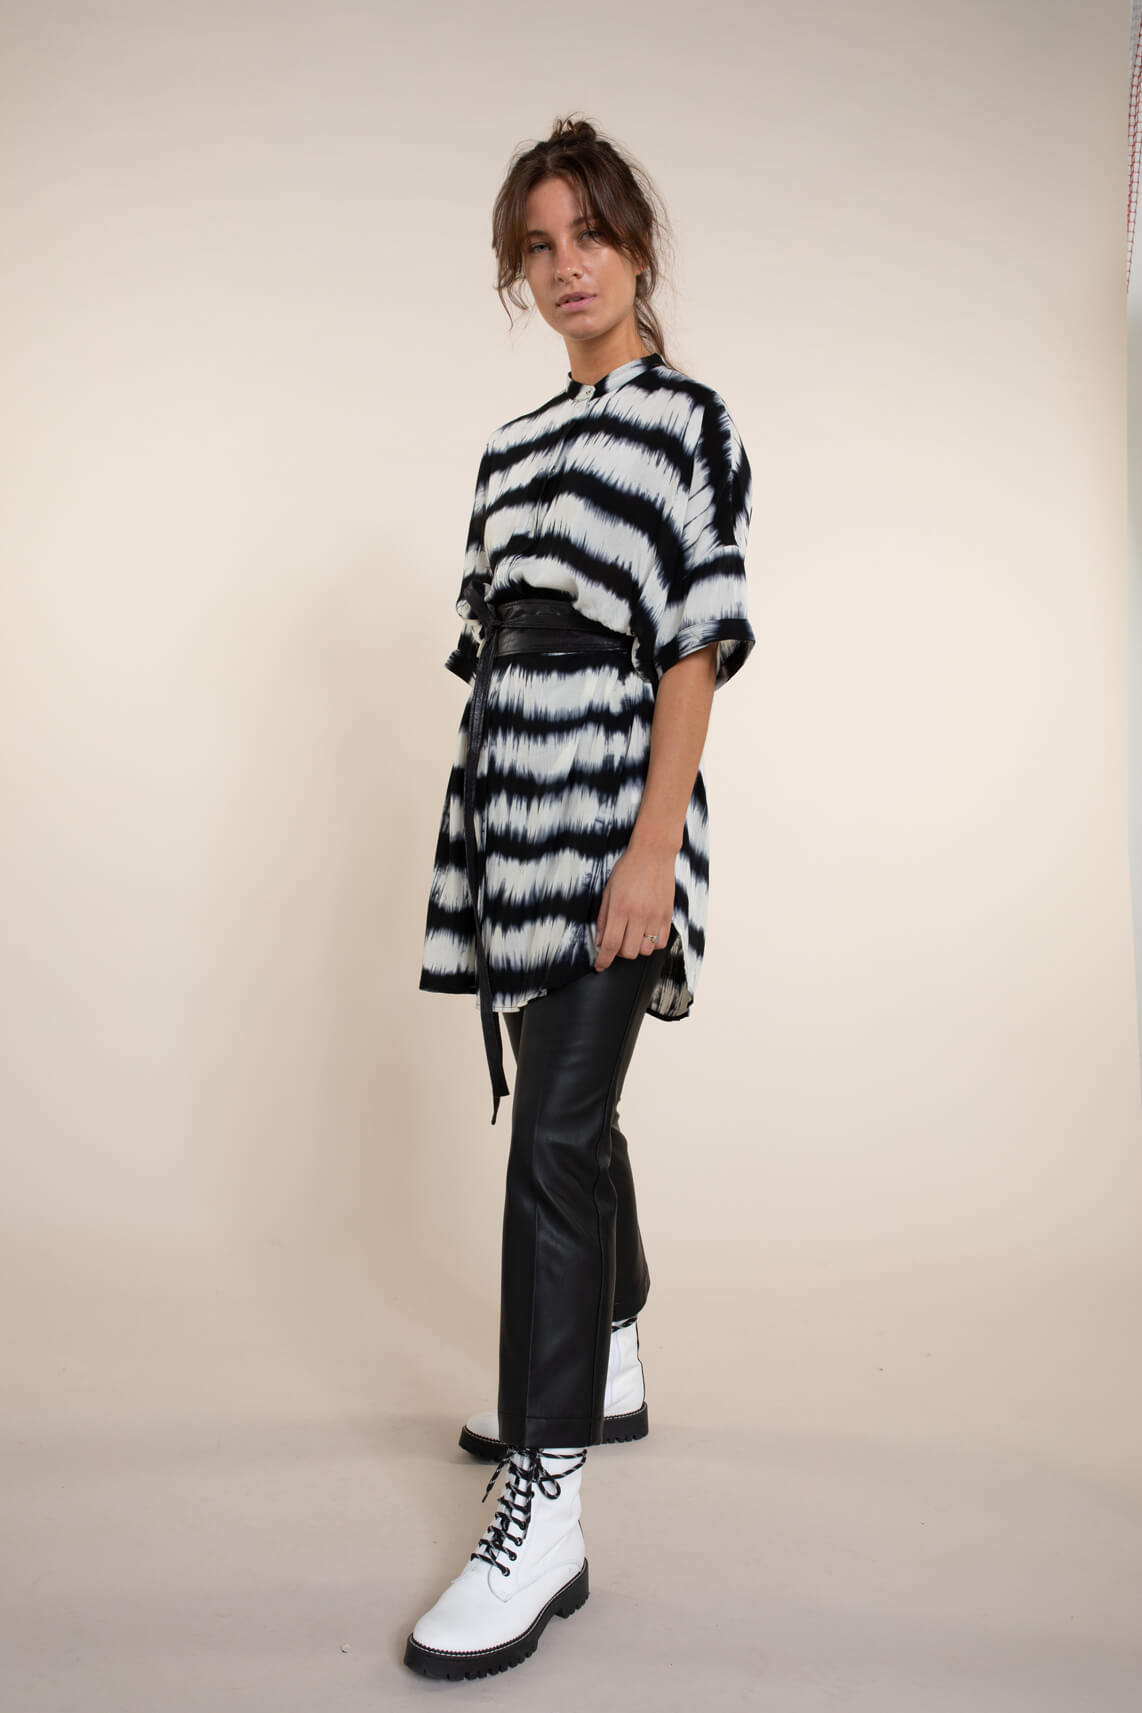 Co Couture Dames Fenton tuniek zwart